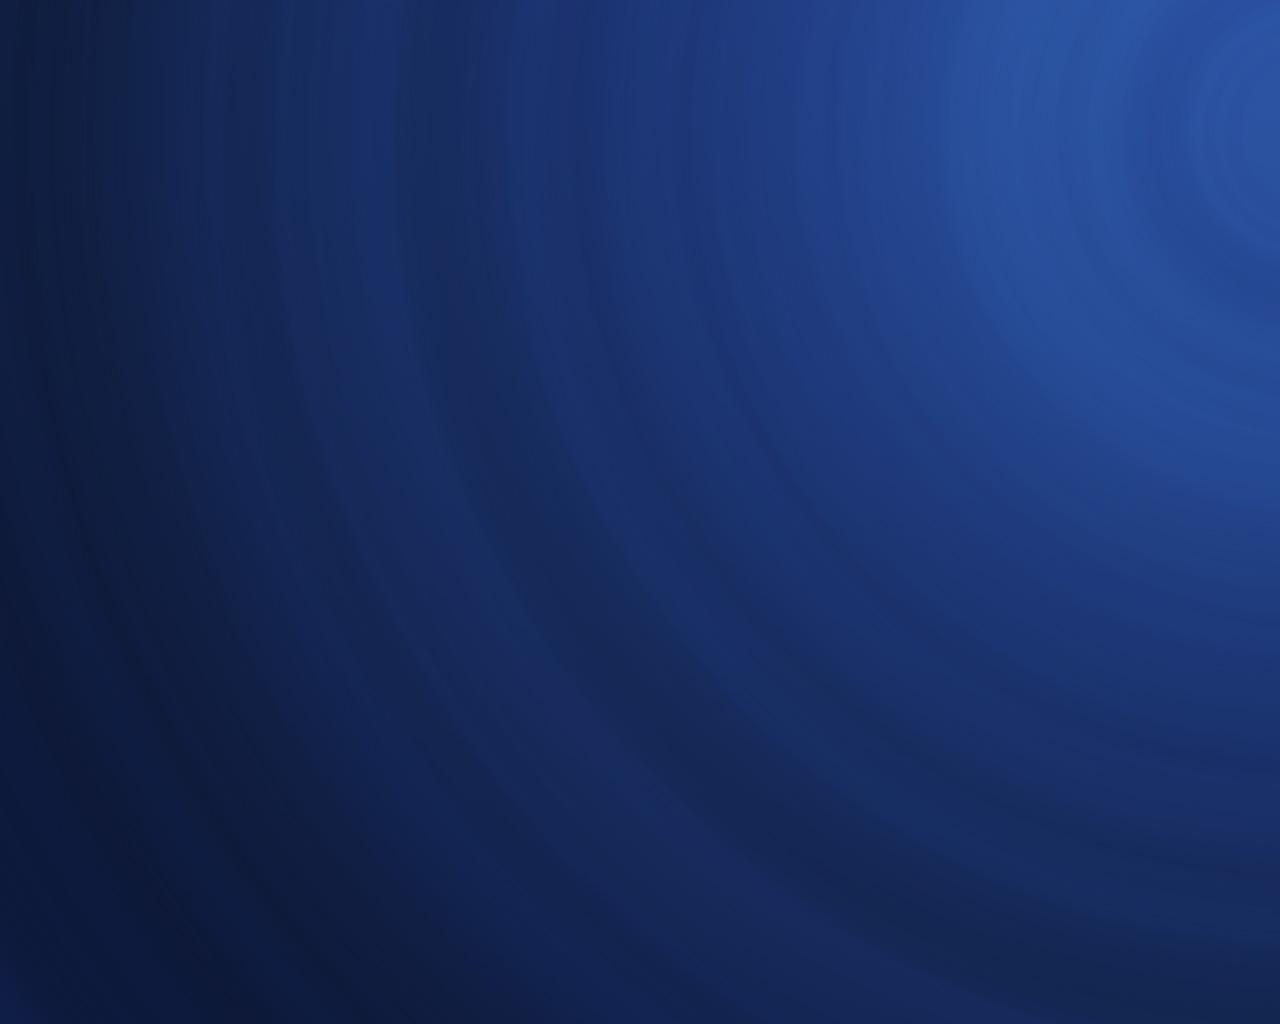 Plain Blue Backgrounds wallpaper Plain Blue Backgrounds hd wallpaper 1280x1024